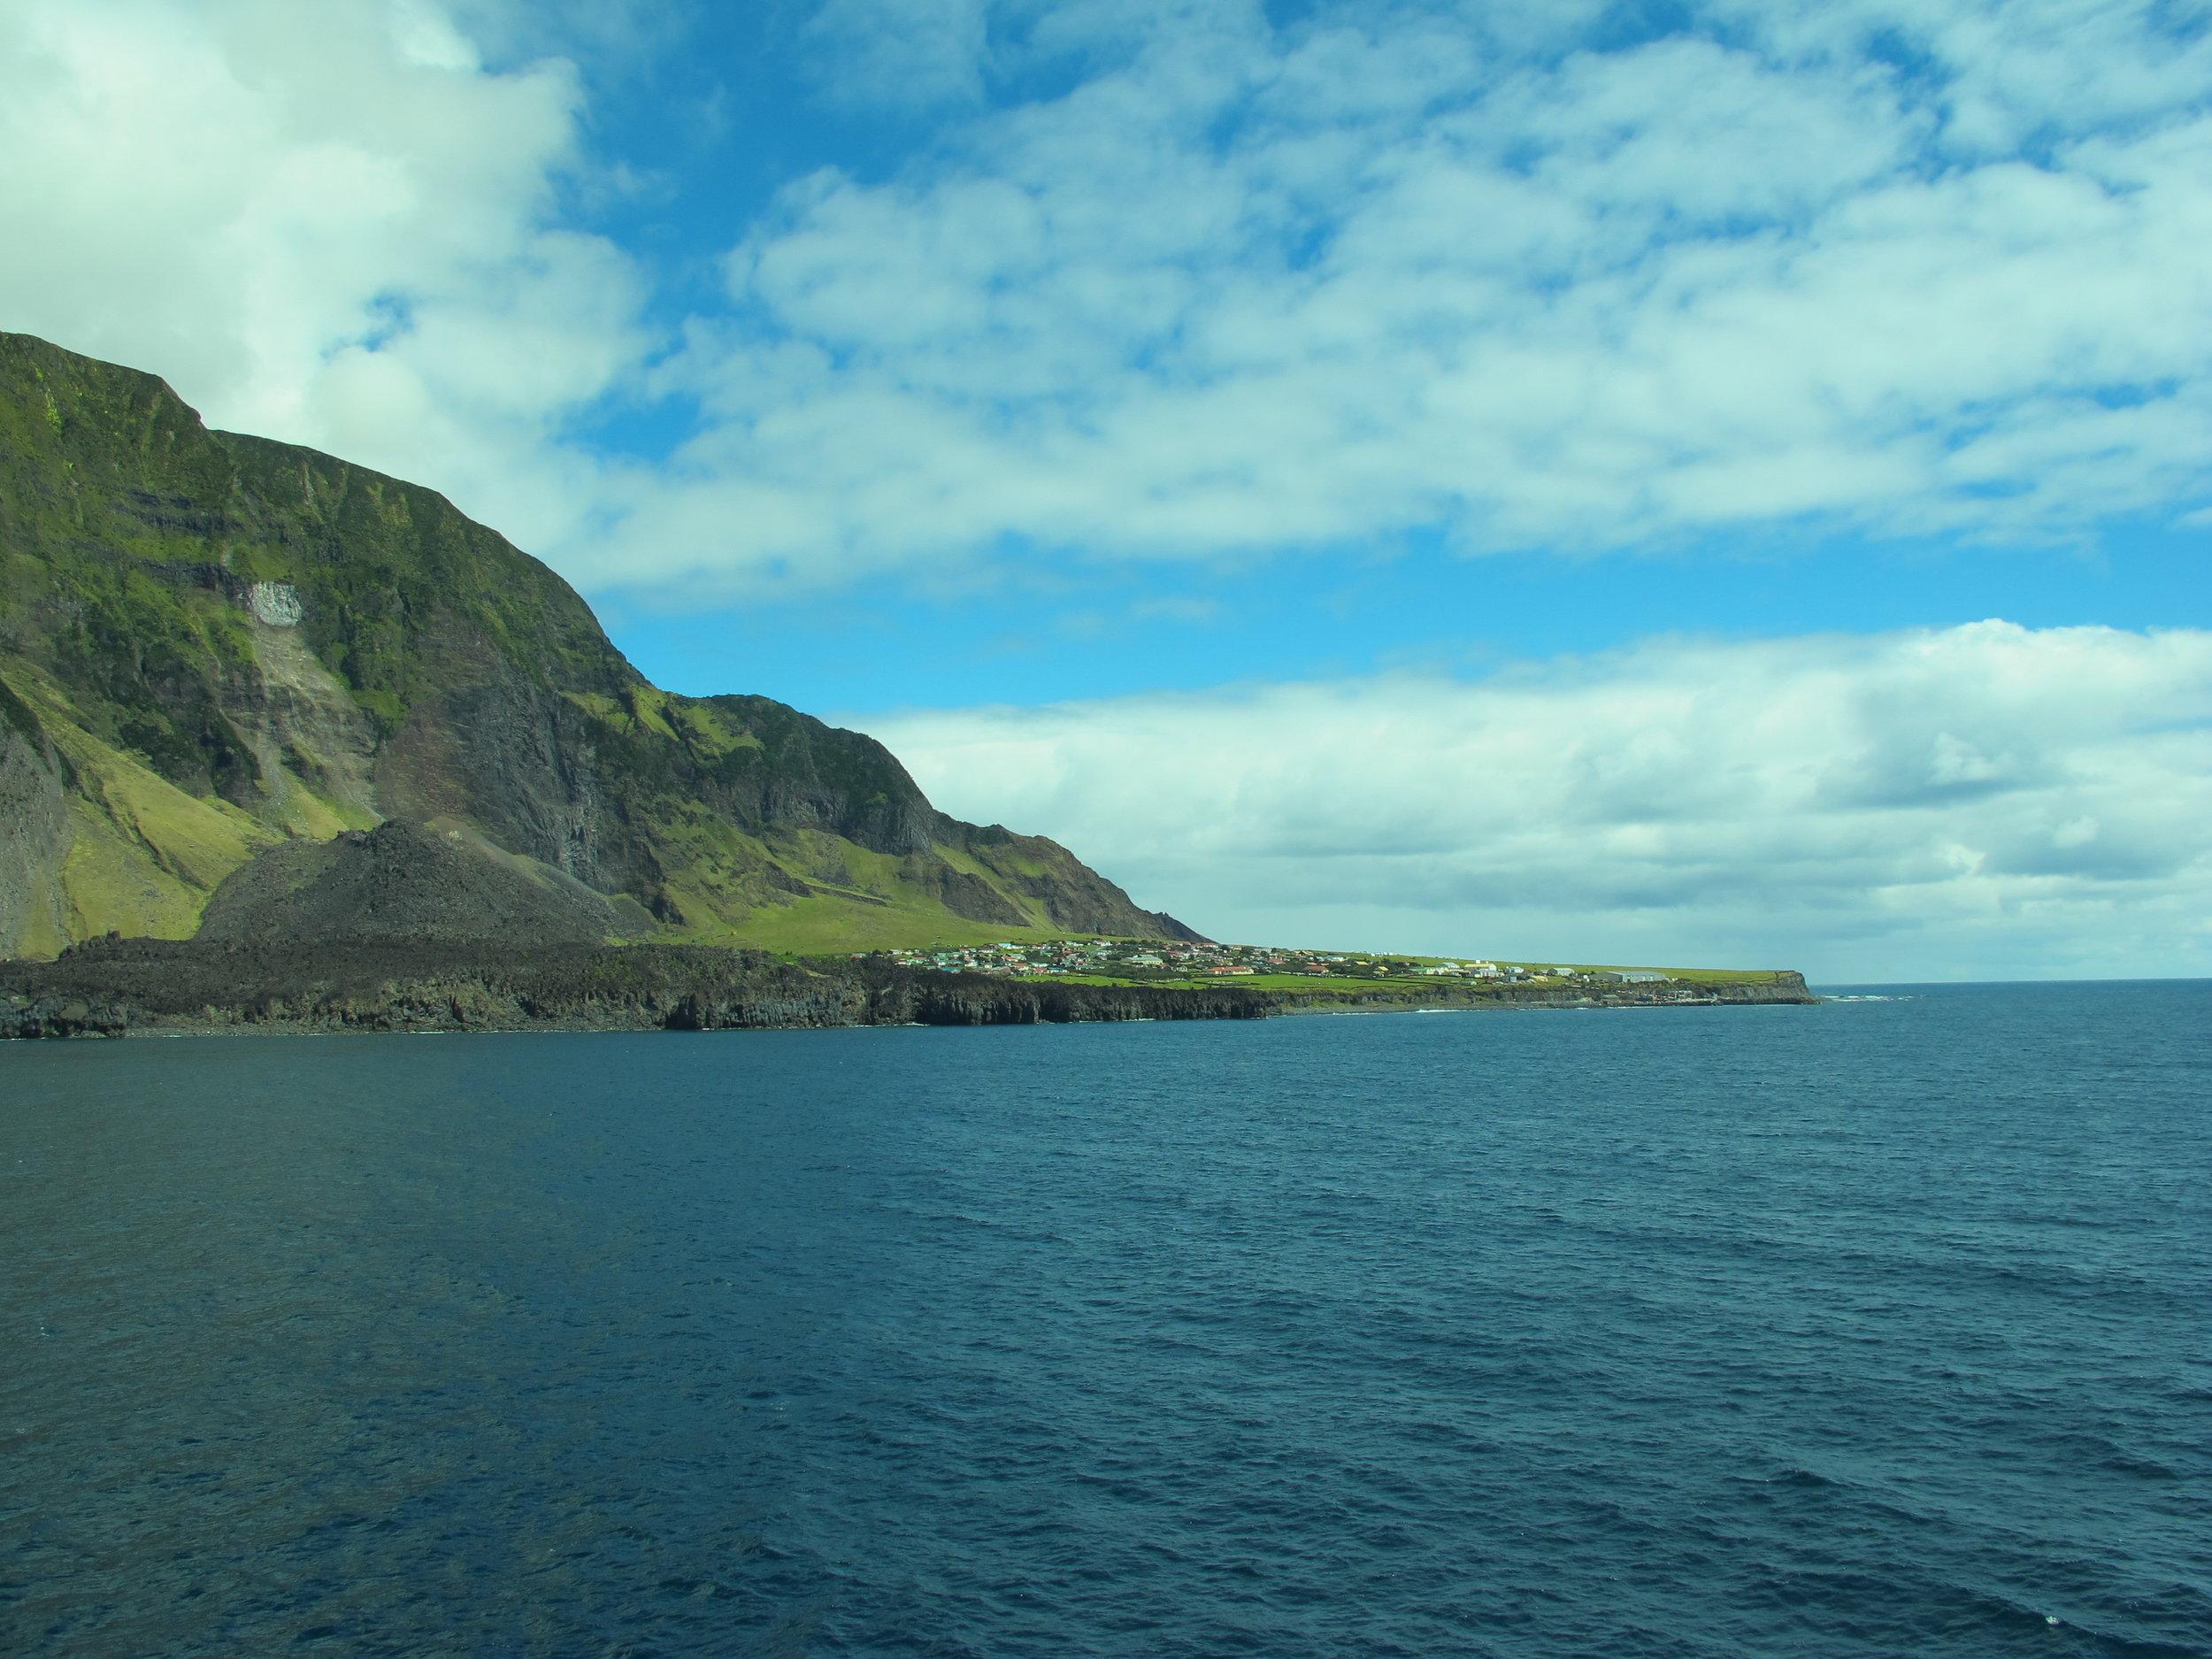 Photo credit:Edinburgh of the Seven Seas, Tristan da Cunha by Hugh Broughton Architects